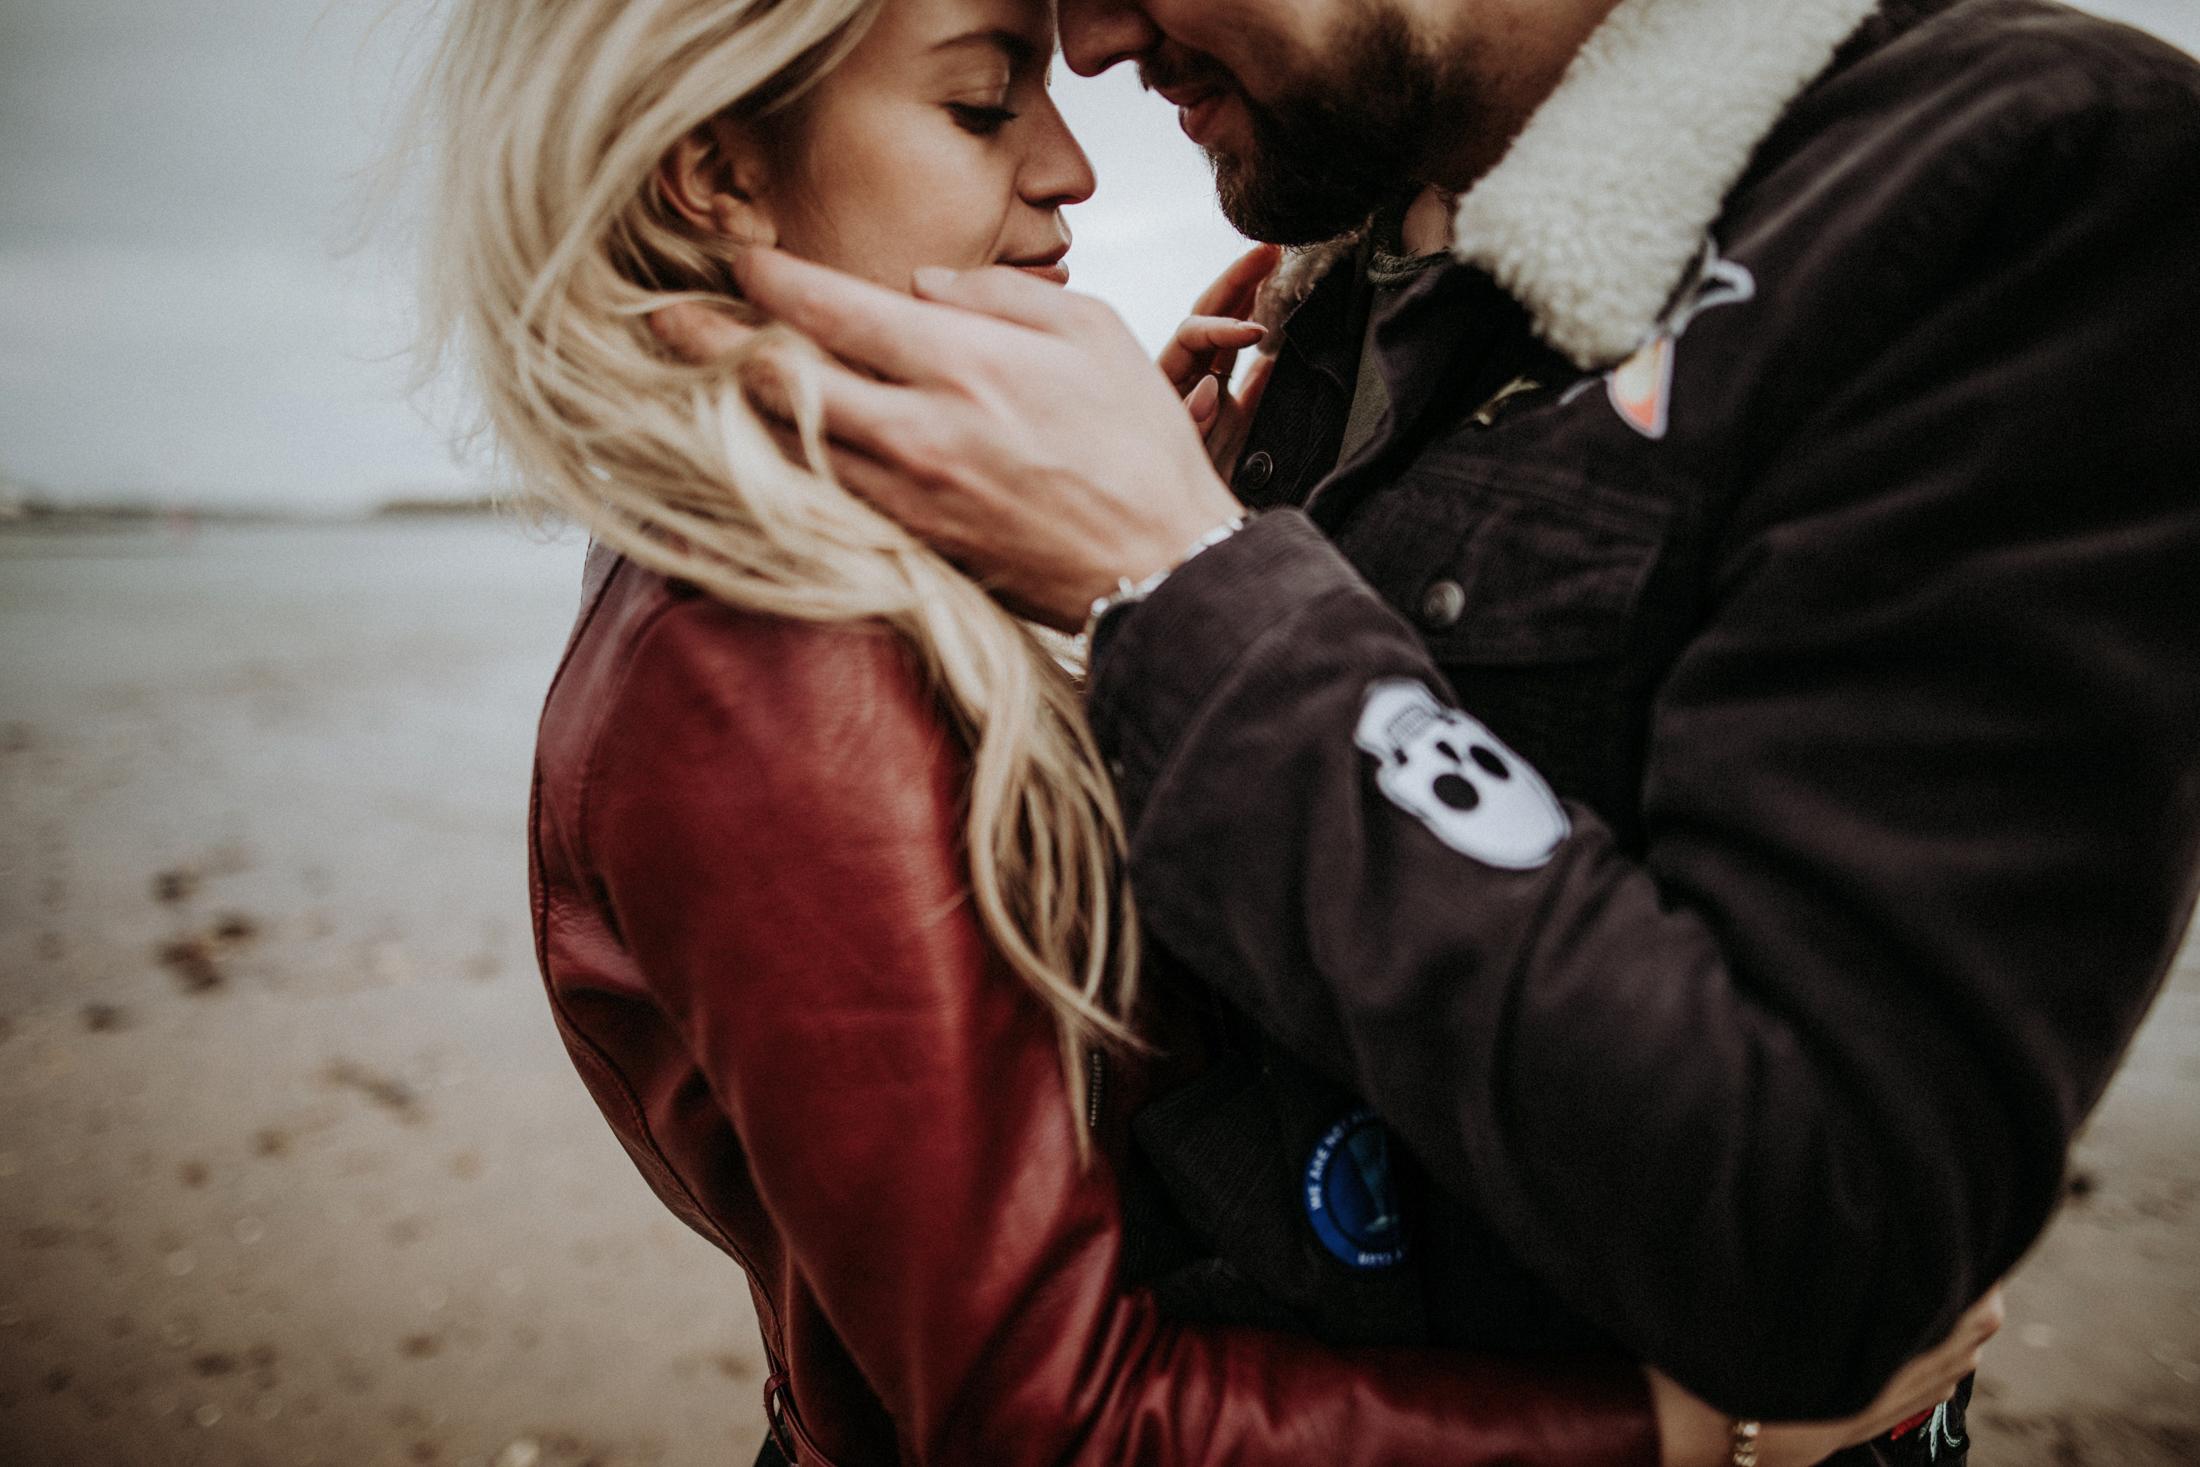 Wedding_Photographer_Mallorca_DanielaMarquardt_Photography_CanaryIslands_Lanzarote_Iceland_Tuscany_Santorini_Portugal_NewYork_Spain_Elopement_Hochzeitsfotograf_CK66